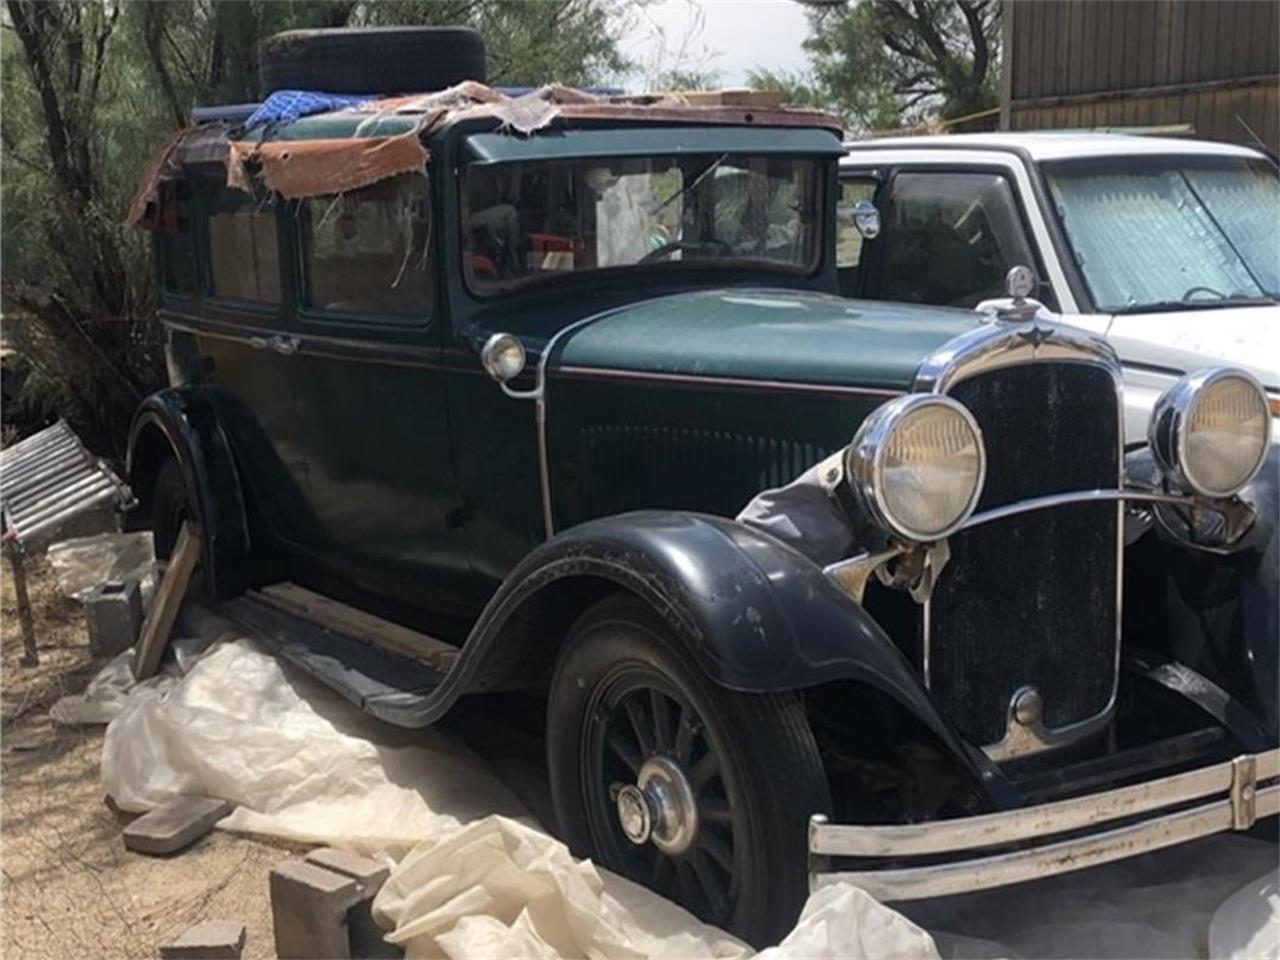 1929 Dodge Brothers Sedan (CC-1360843) for sale in La joya, New Mexico